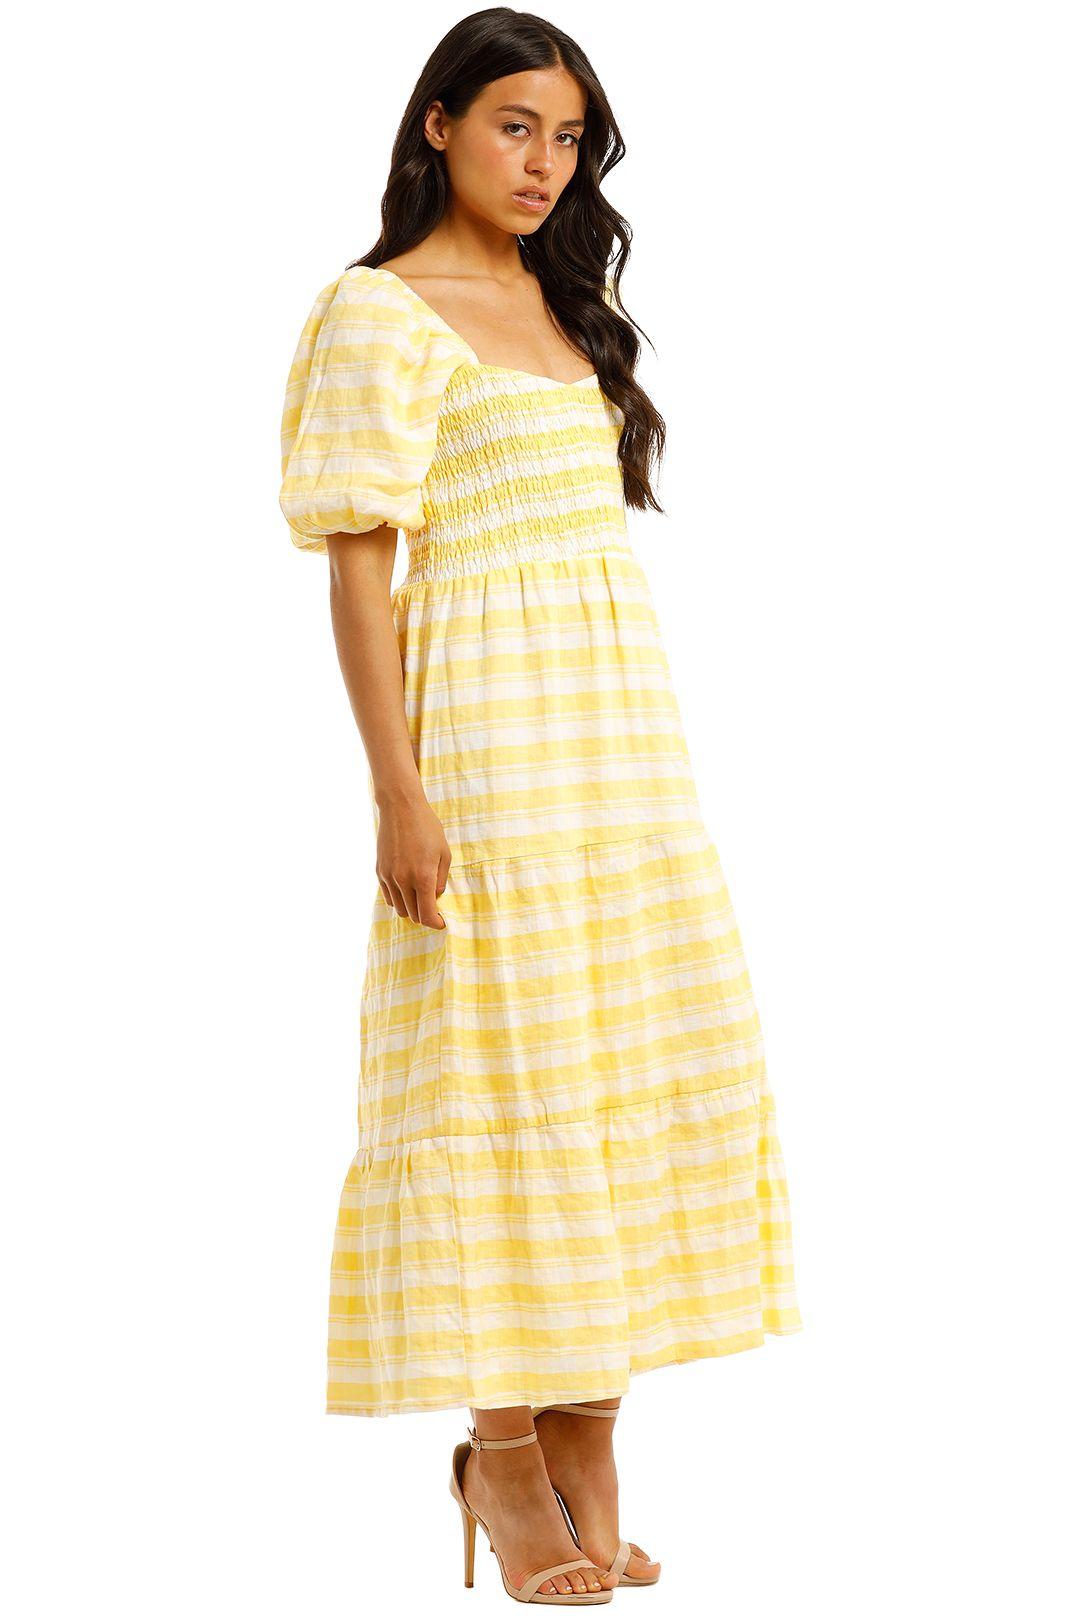 Faithfull-Gianna-Short-Sleeve-Midi-Dress-Side